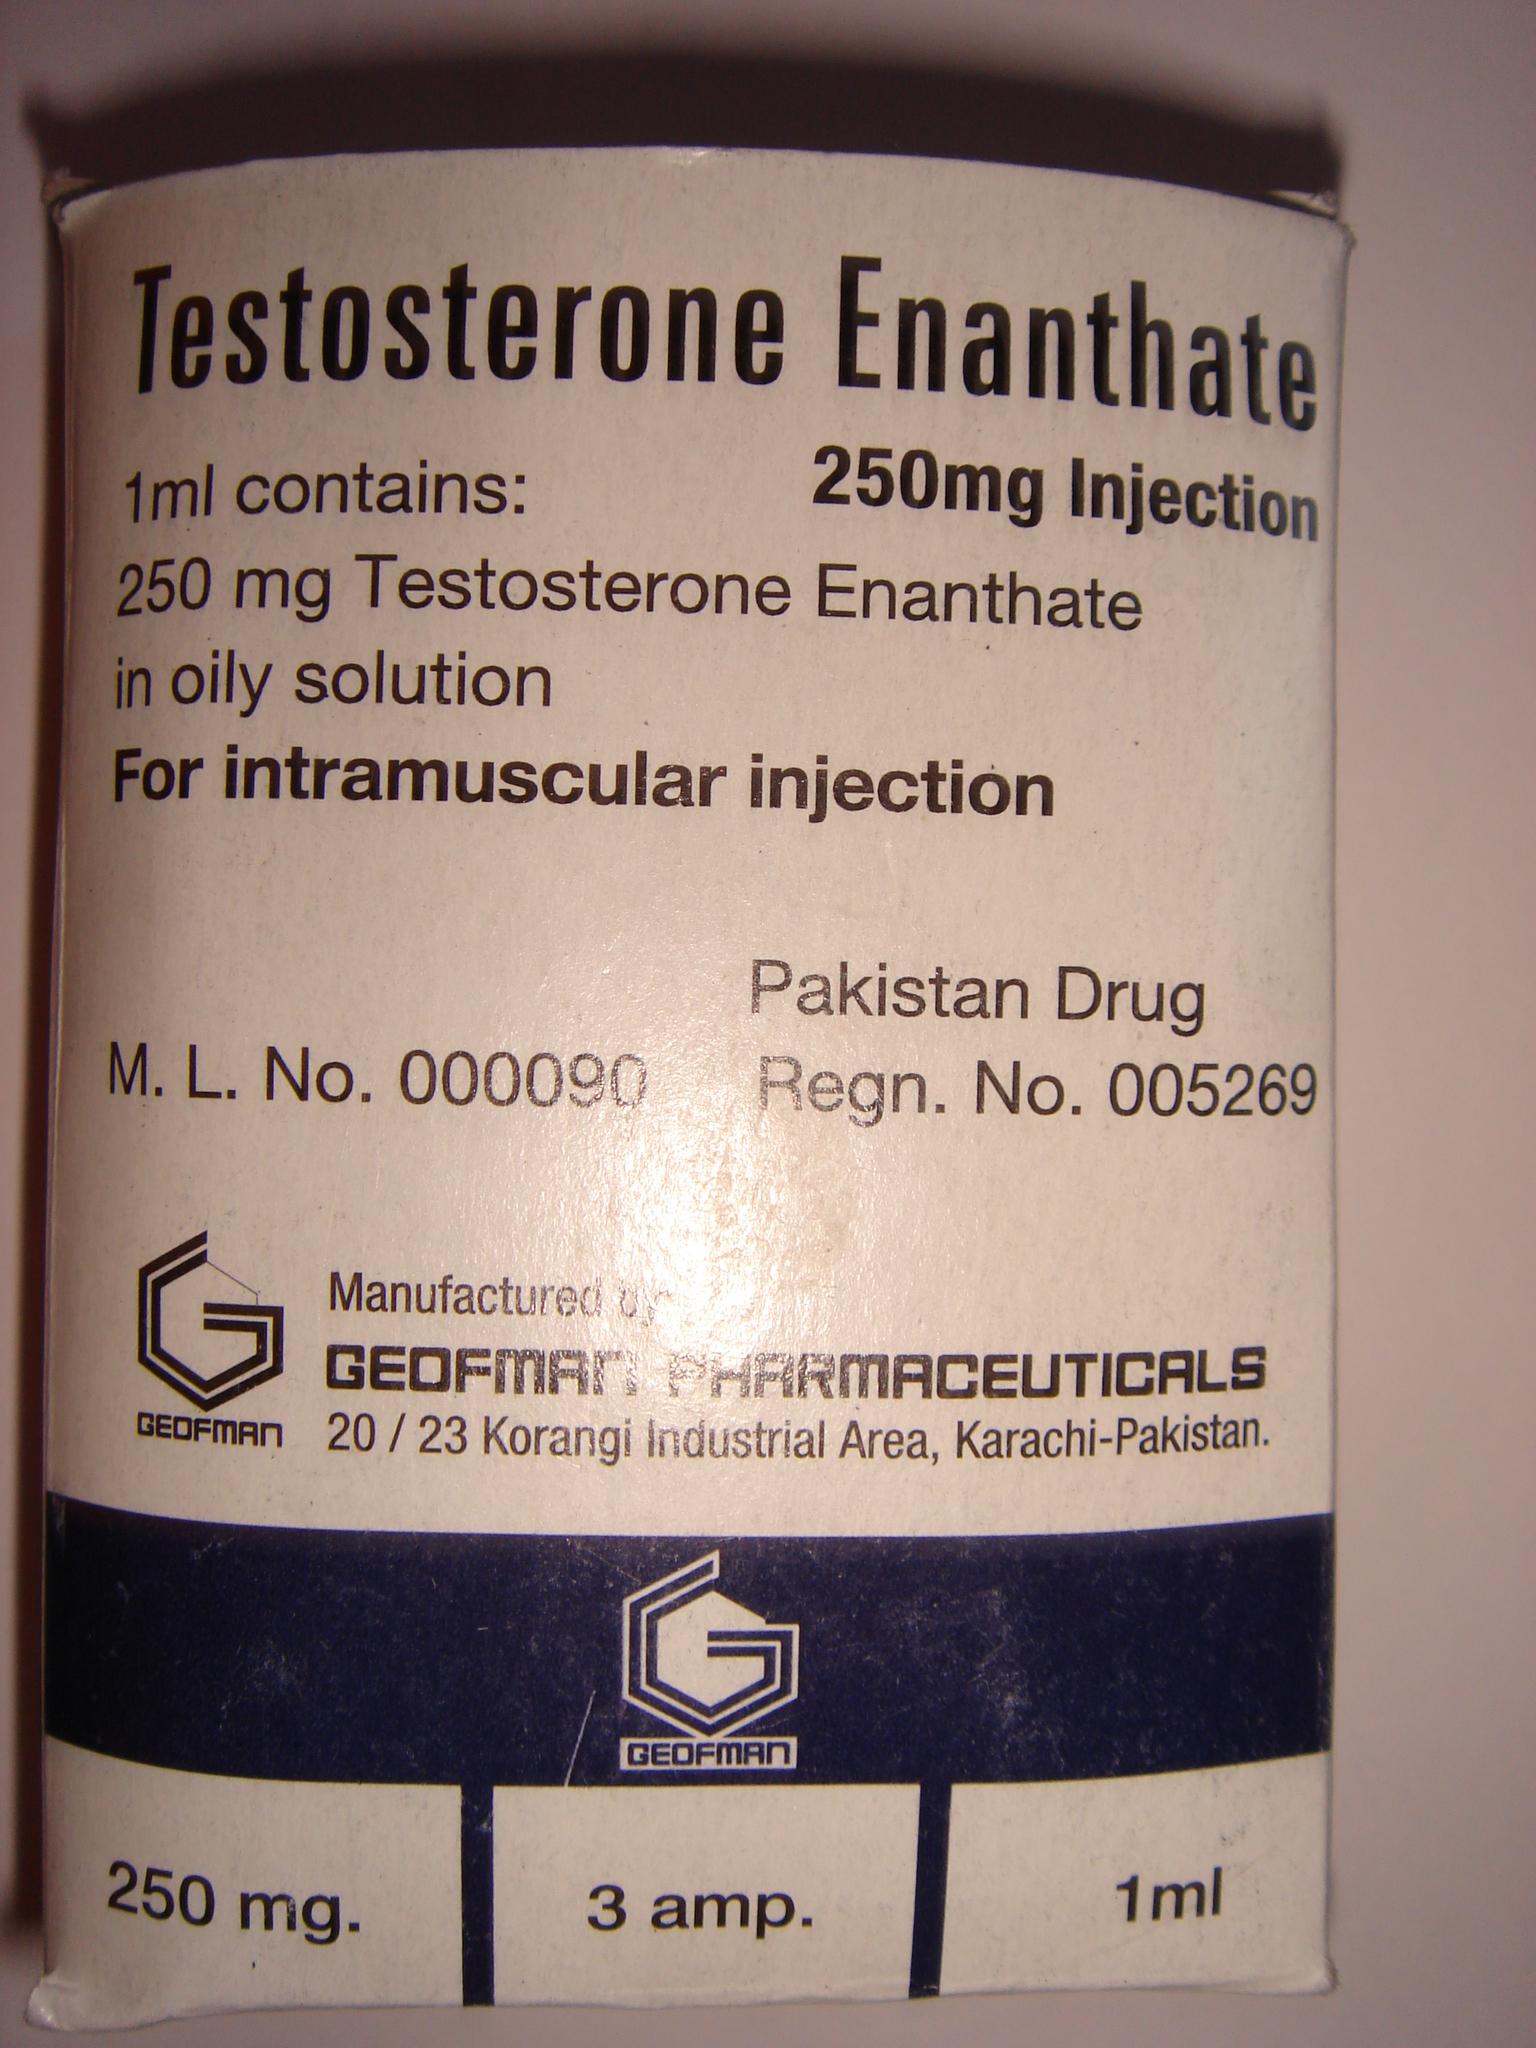 Testosterone Enanthate - Karachi Pakistan